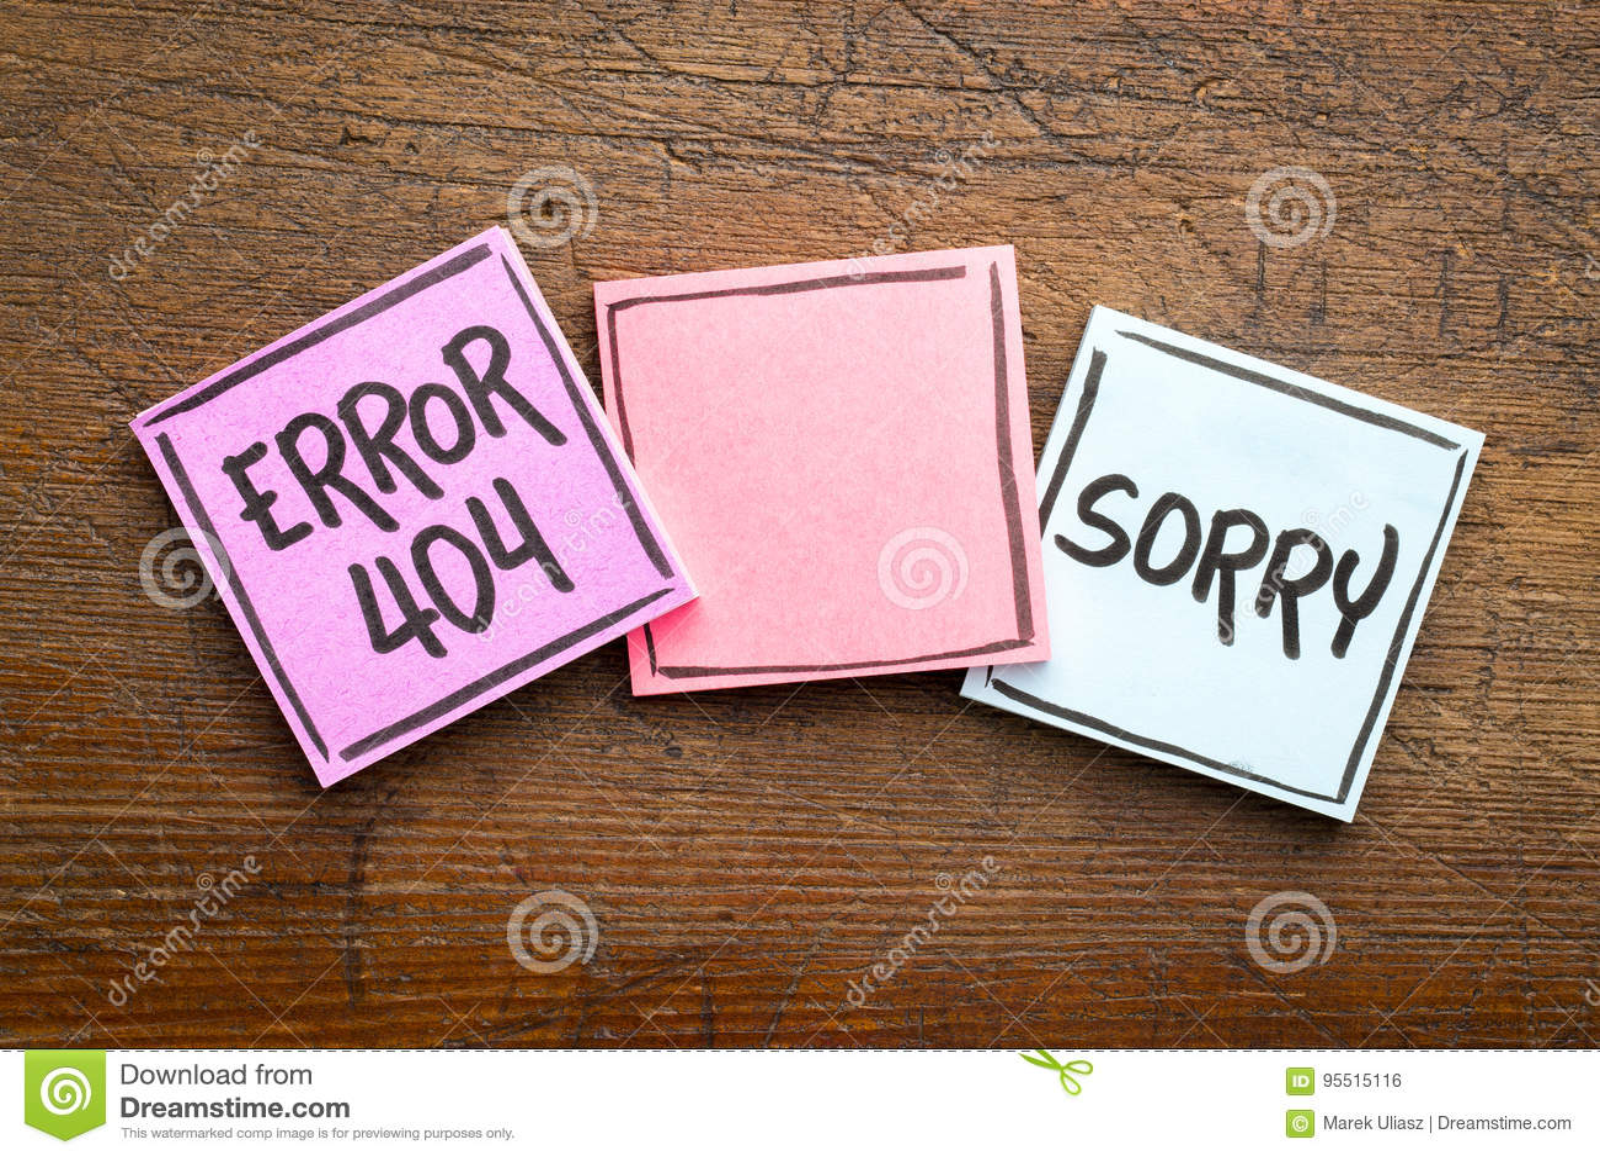 Droevig, fout 404 - gevonden niet pagina